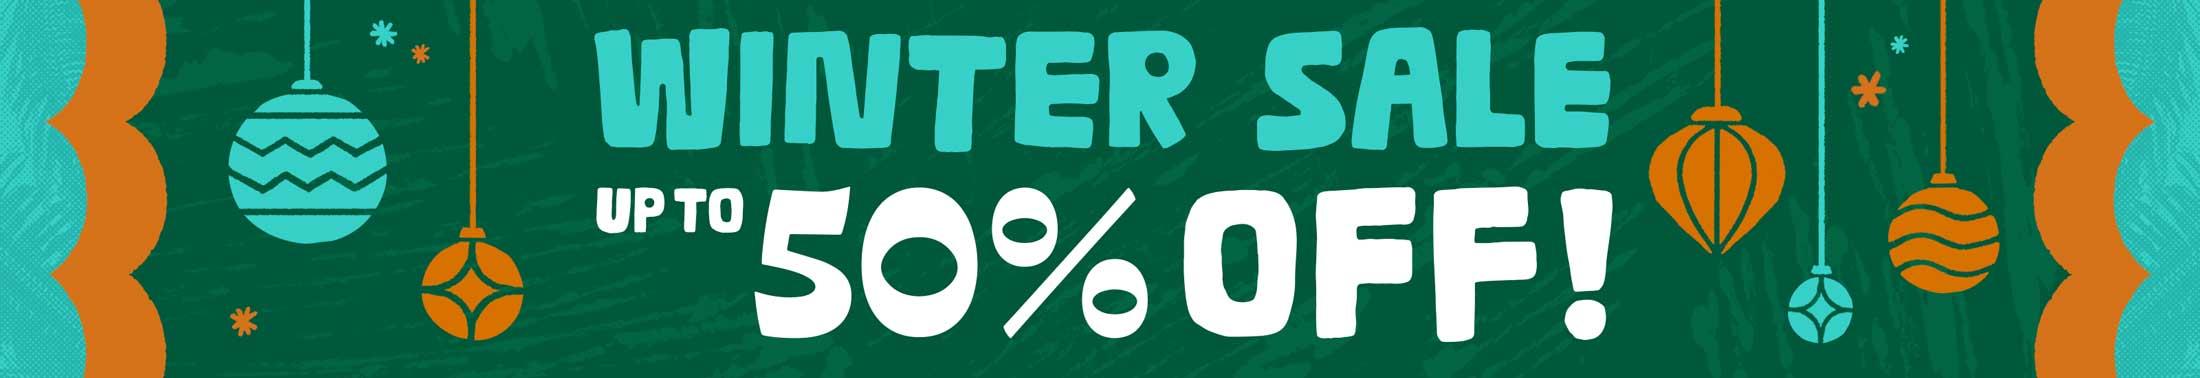 Winter Sale: 50% off